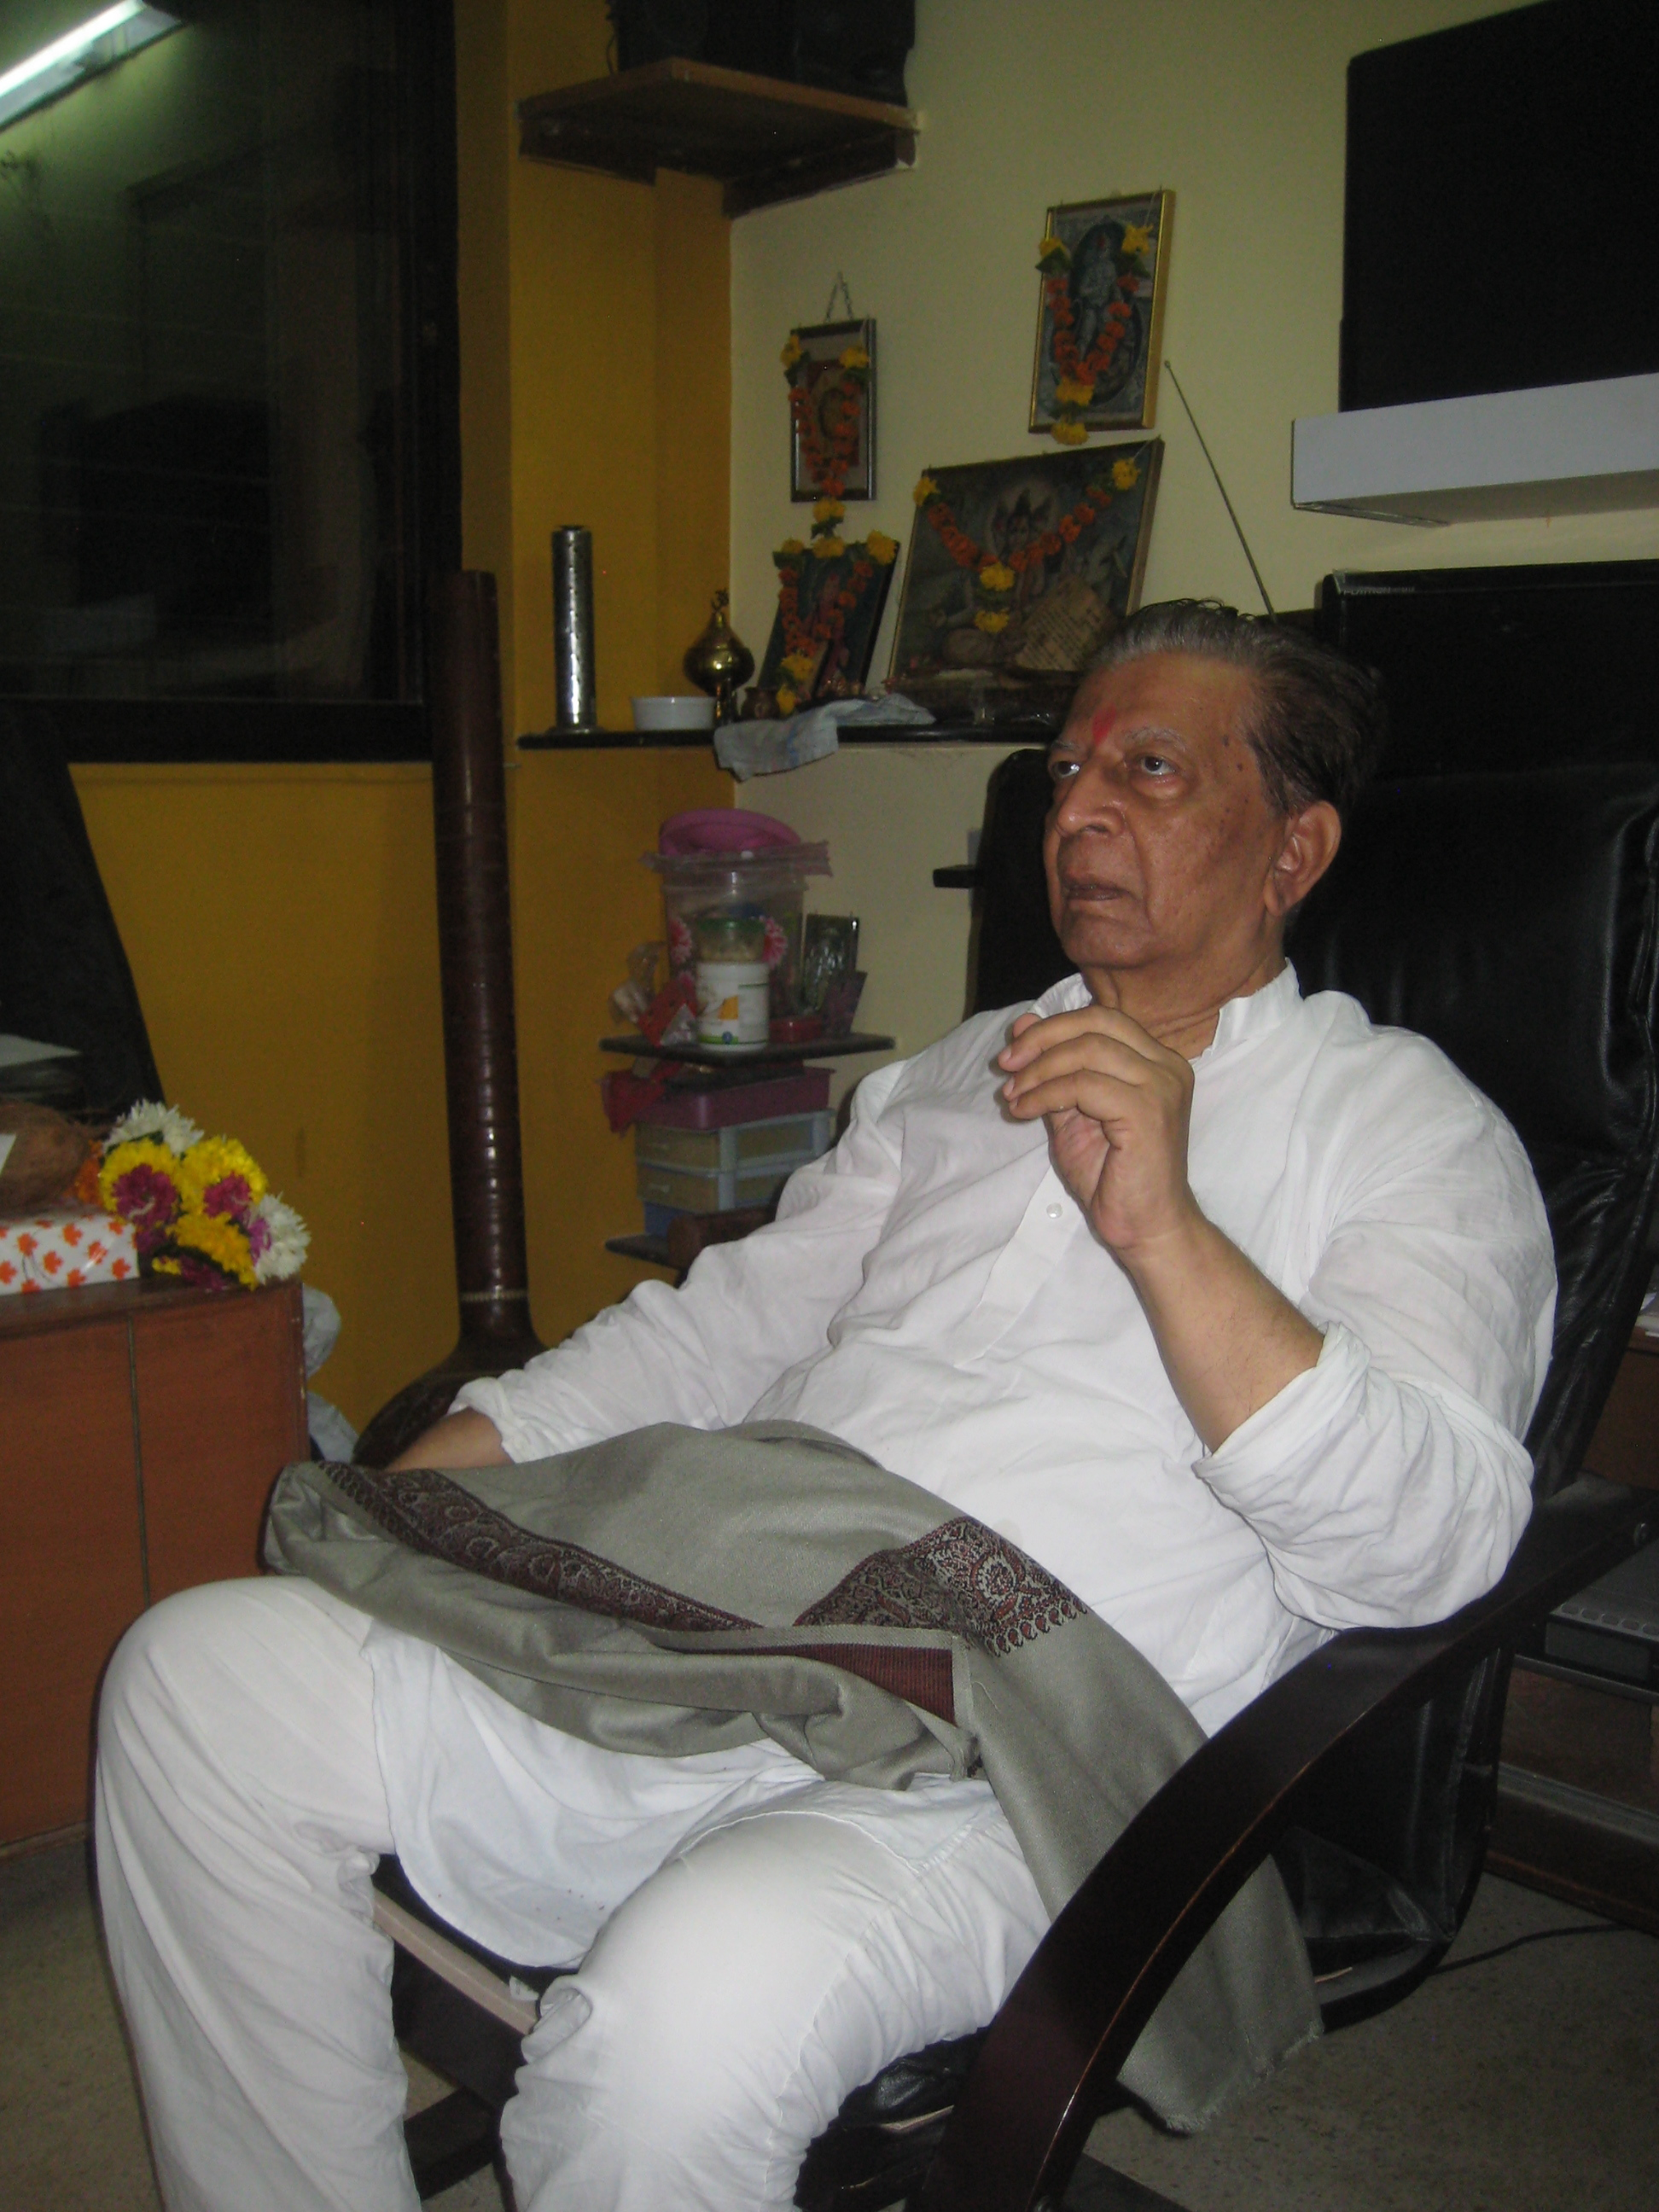 Pandit Sudhir Mainkar, Chaz's guru in Mumbai